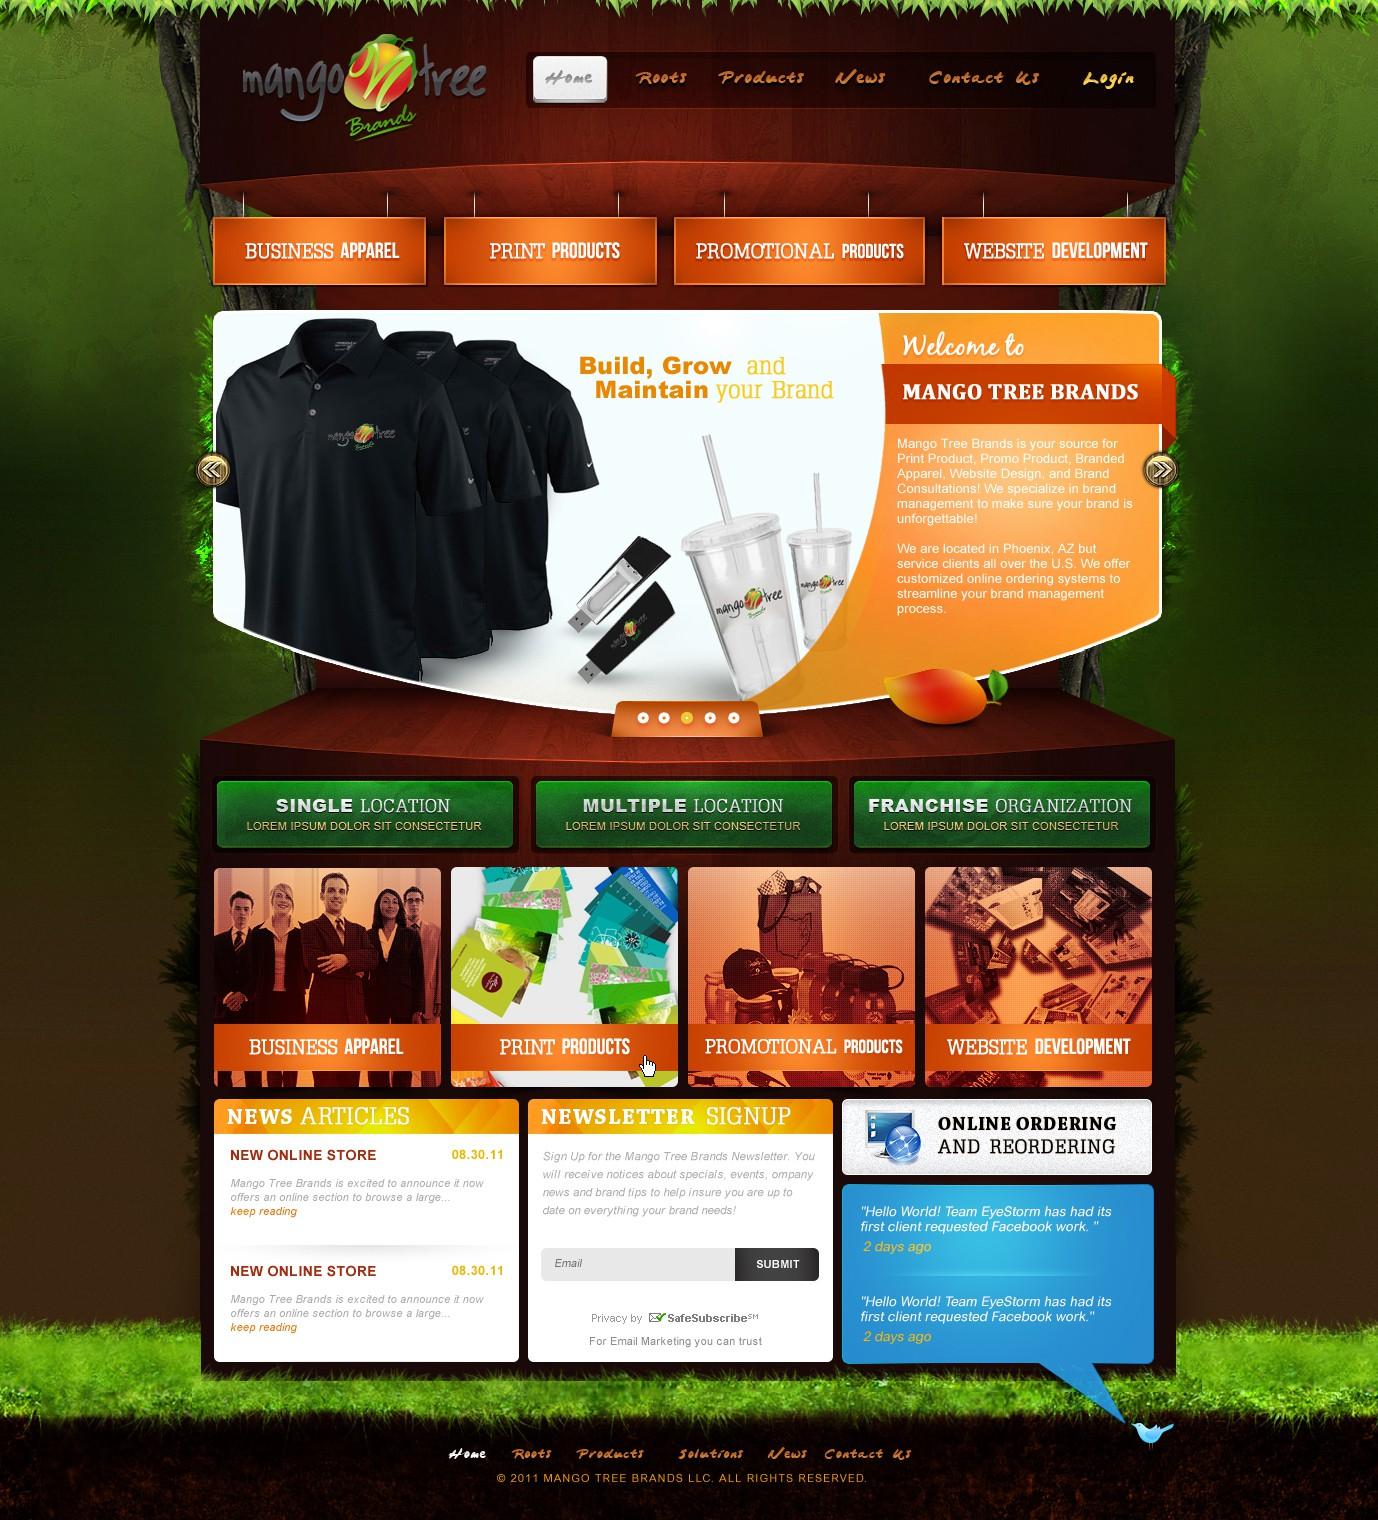 Create the next website design for Mango Tree Brands